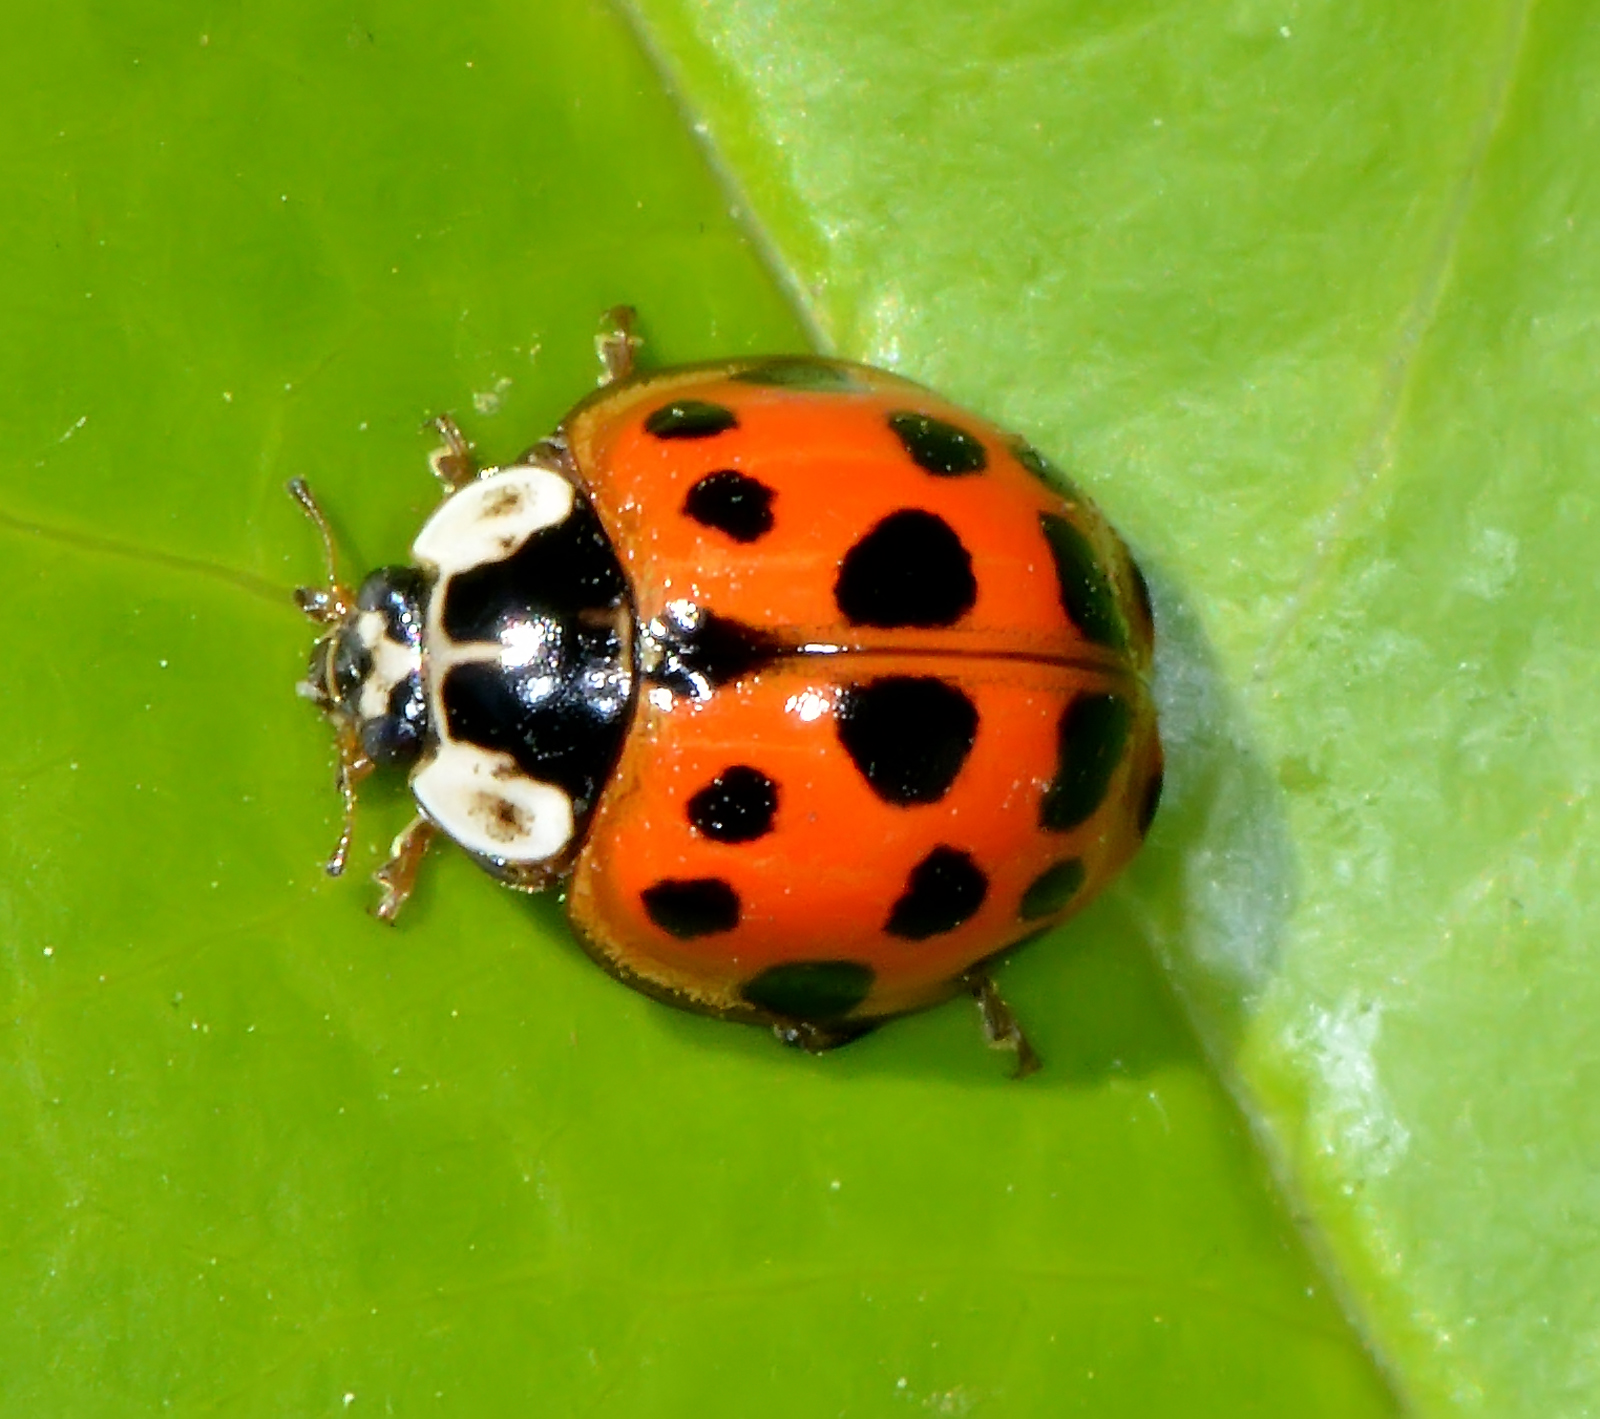 Multicolored-Asian-Lady-Beetle-Harmonia-axyridis-Austin-Insects